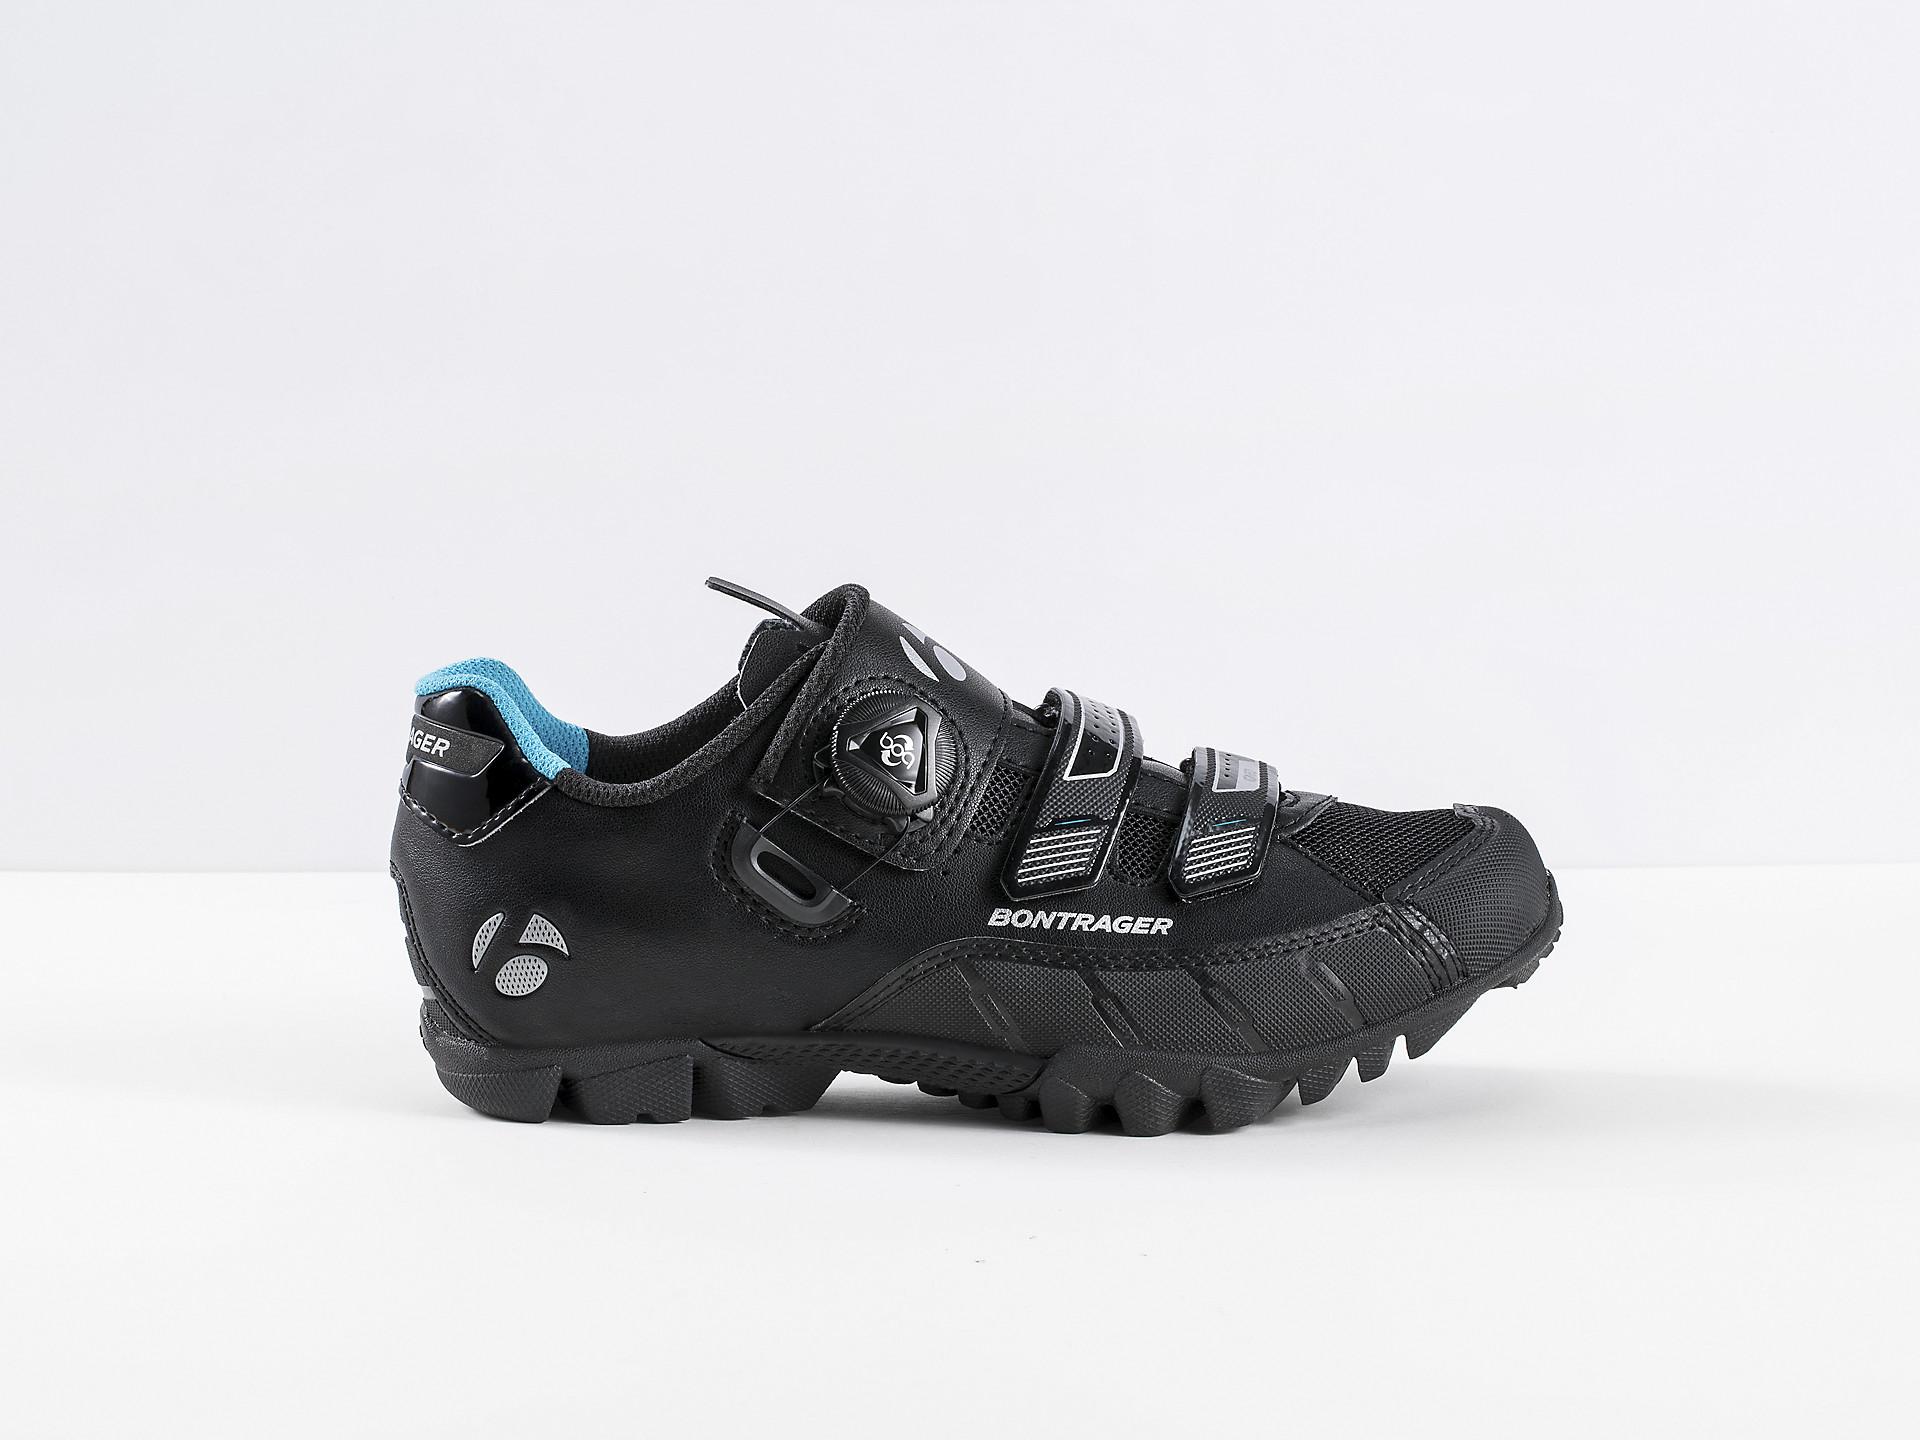 d84f7df66272 Bontrager Igneo Women s Mountain Shoe